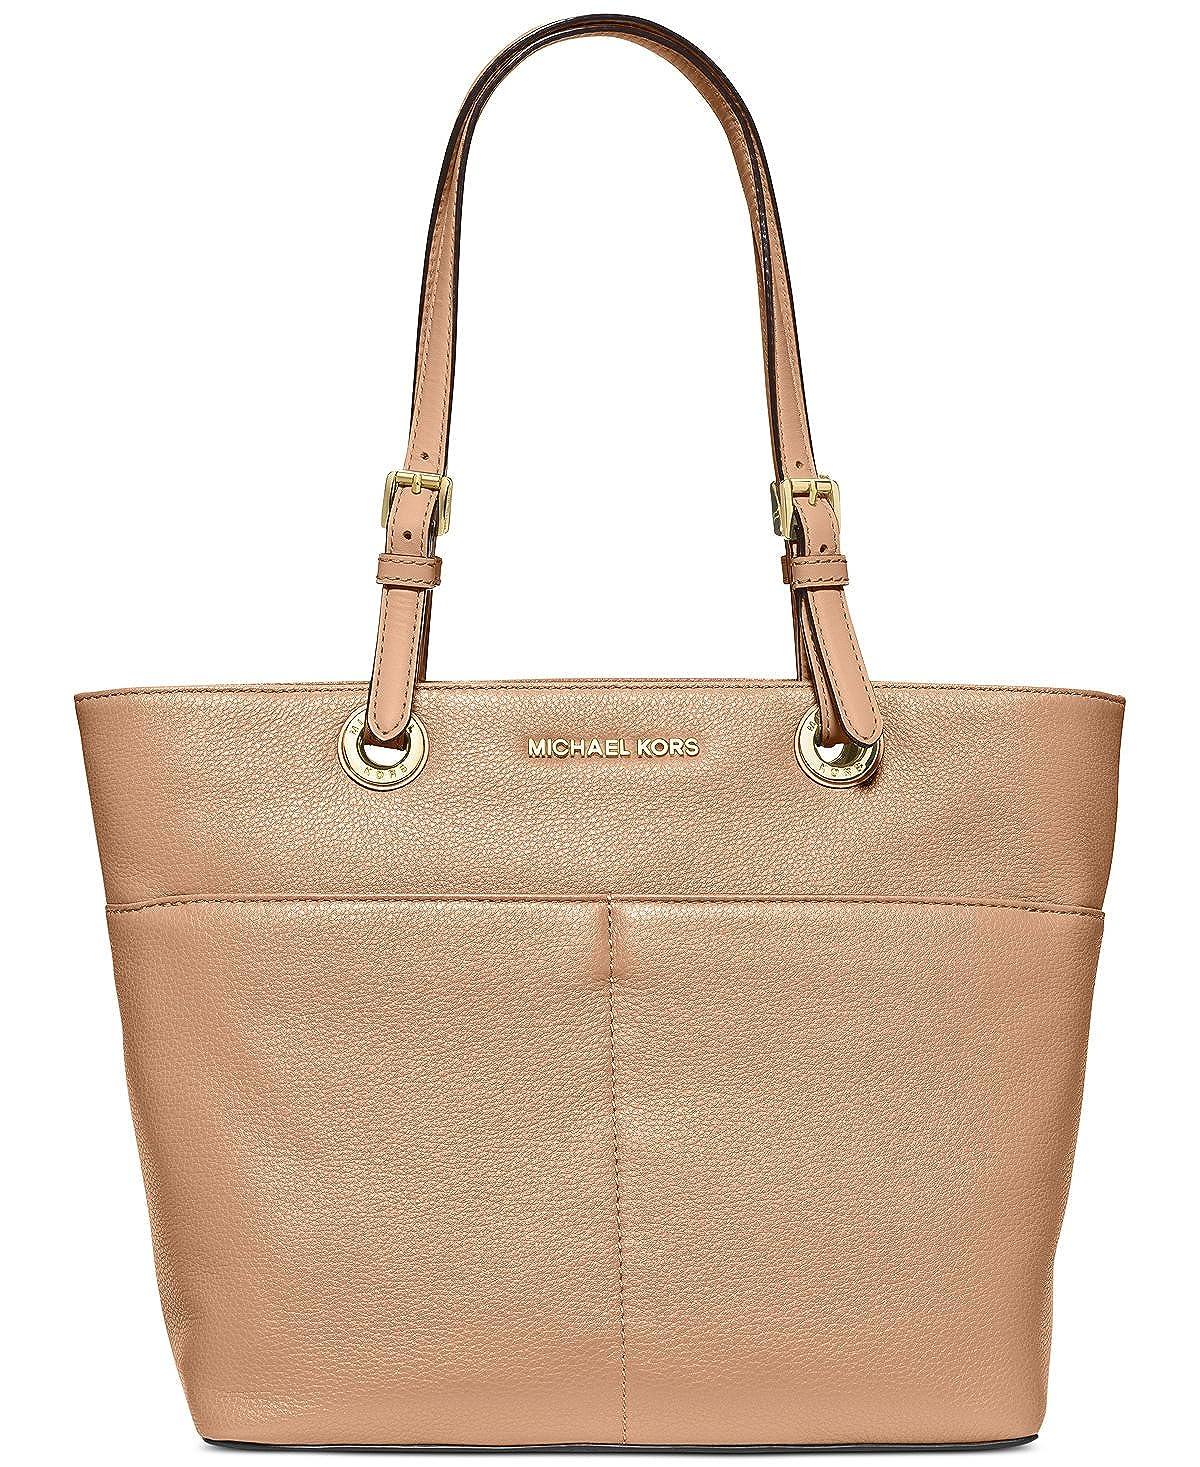 Amazon.com  Michael Kors Women s Bedford Leather Top-Handle Bag Tote -  Acorn  Michael Kors  Shoes ad4a76f08